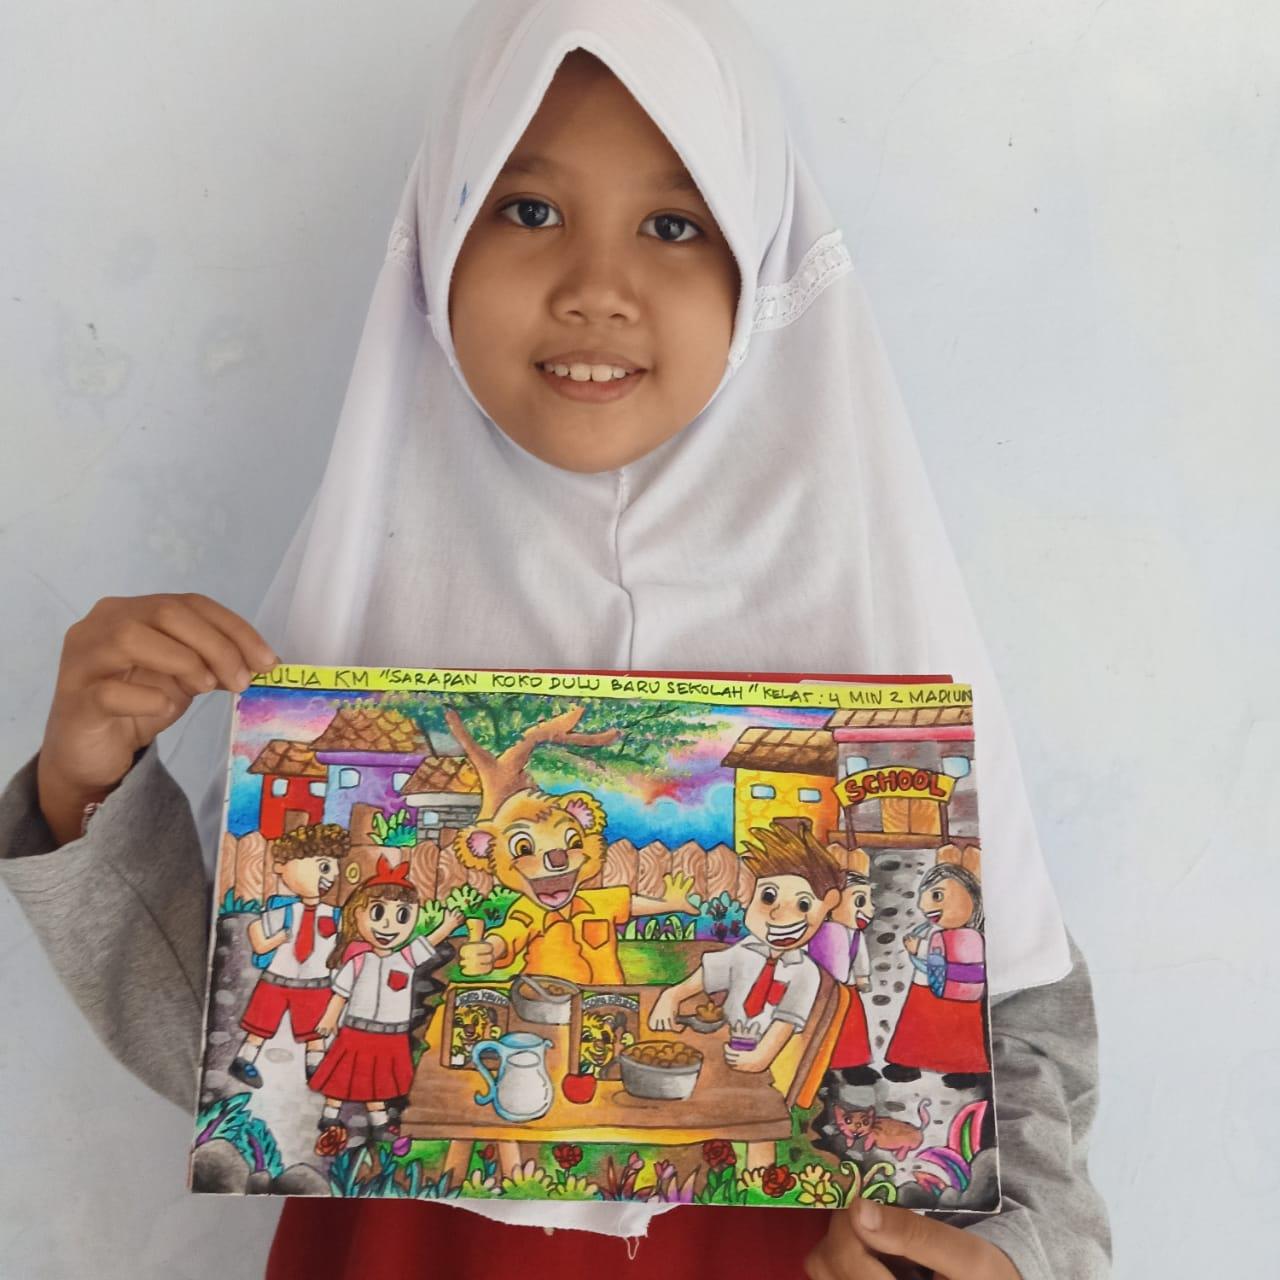 Aulia, Putri MIN 2 Kota Madiun kembali Berprestasi dalam Lomba Menggambar